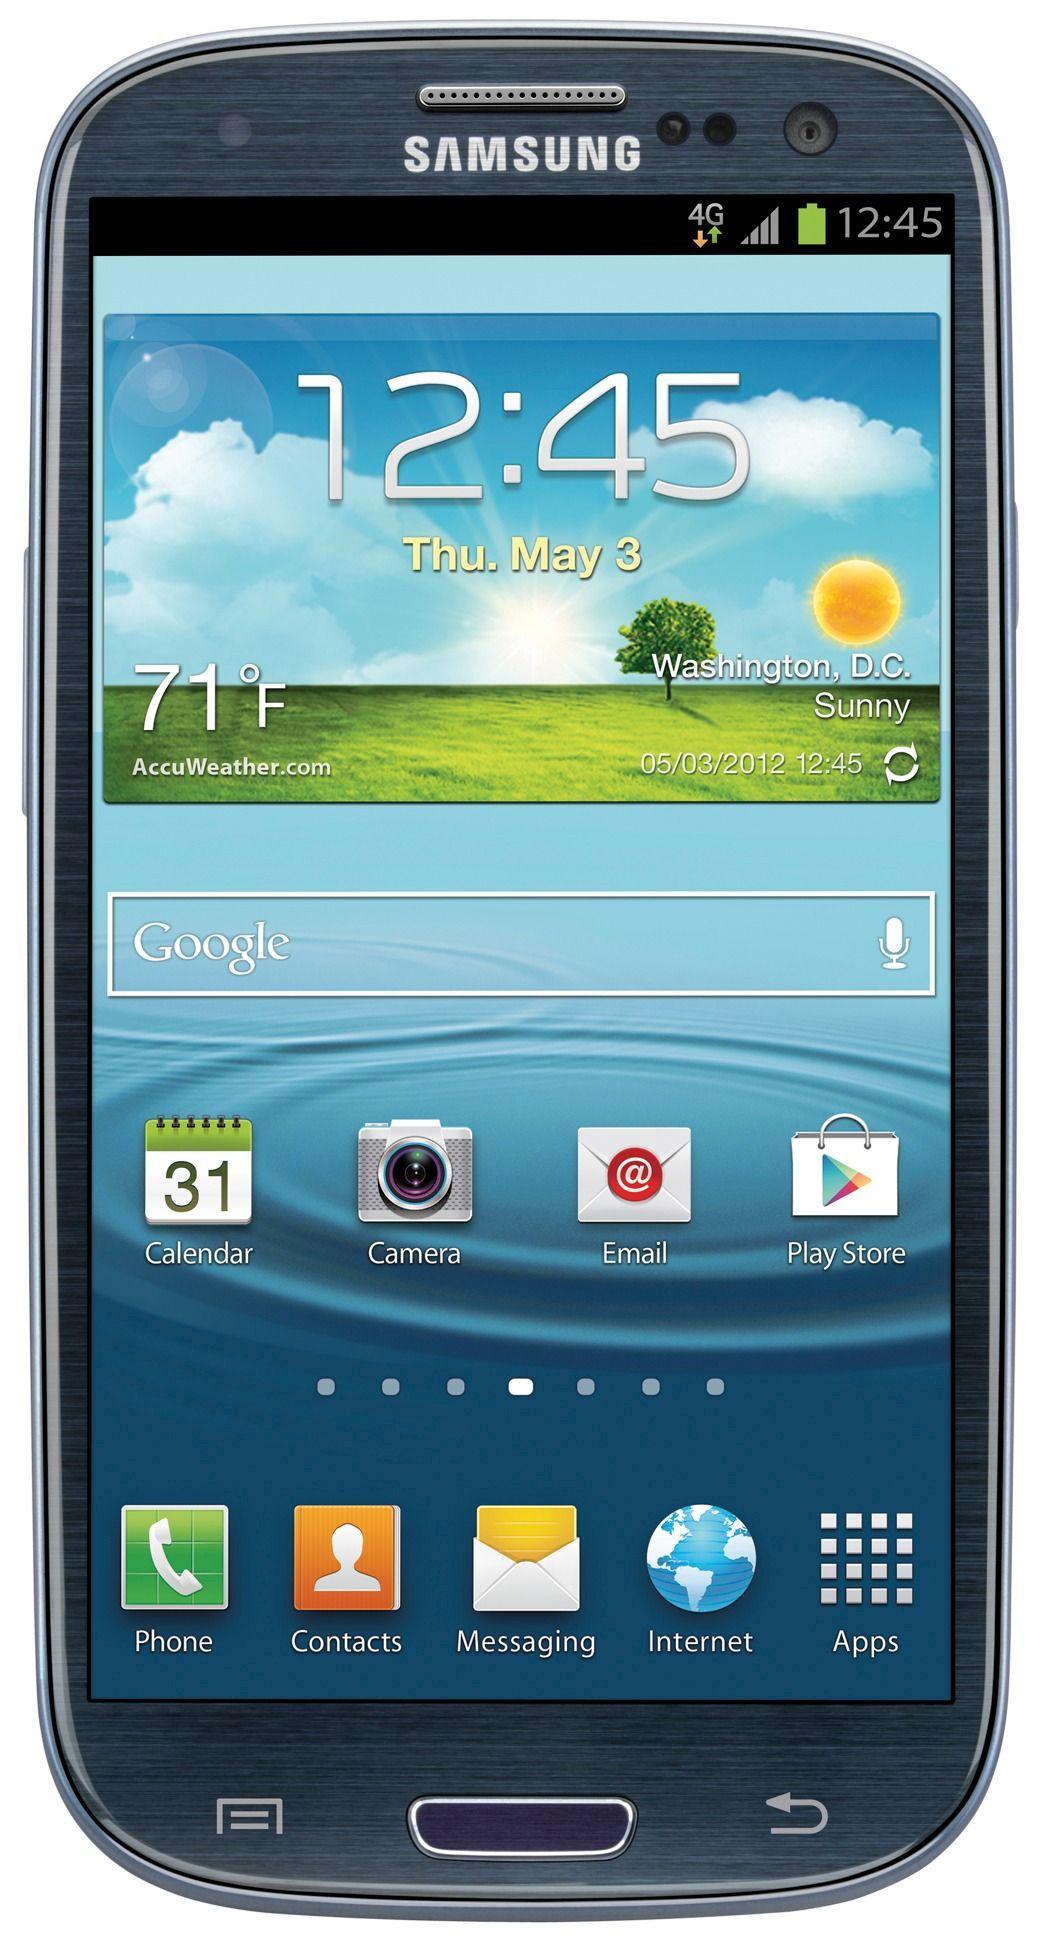 Samsung L9300 Samsung galaxy s, Samsung galaxy s3